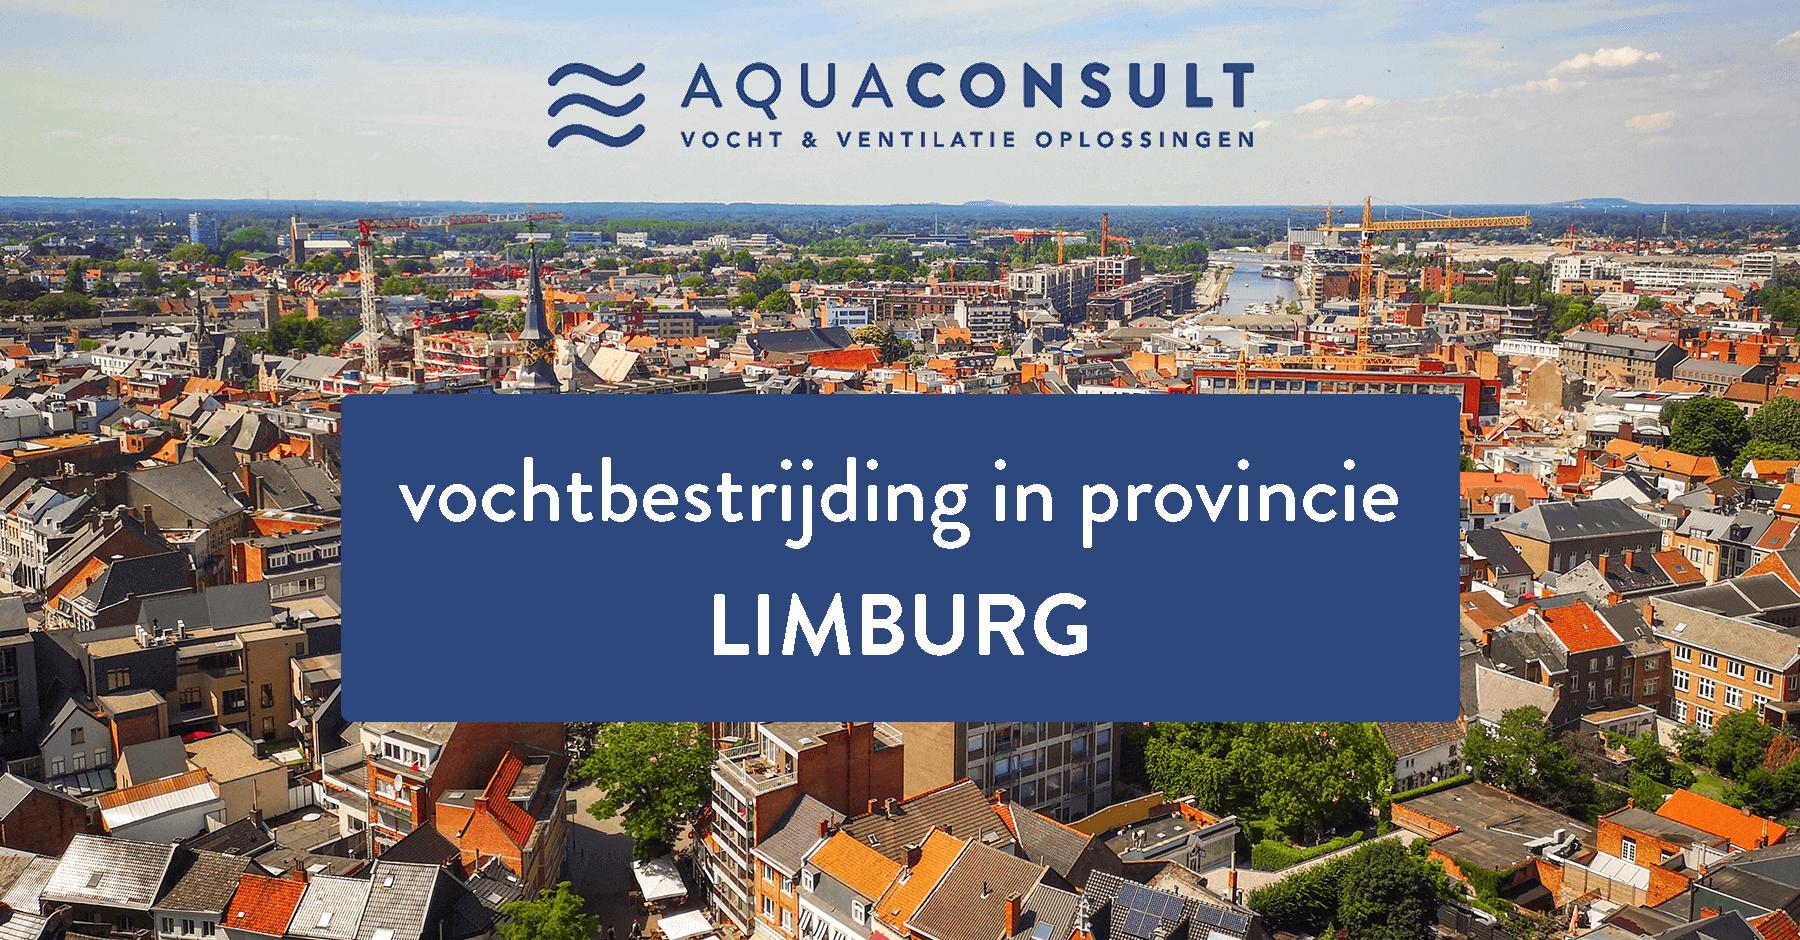 Vochtbestrijding in provincie Limburg